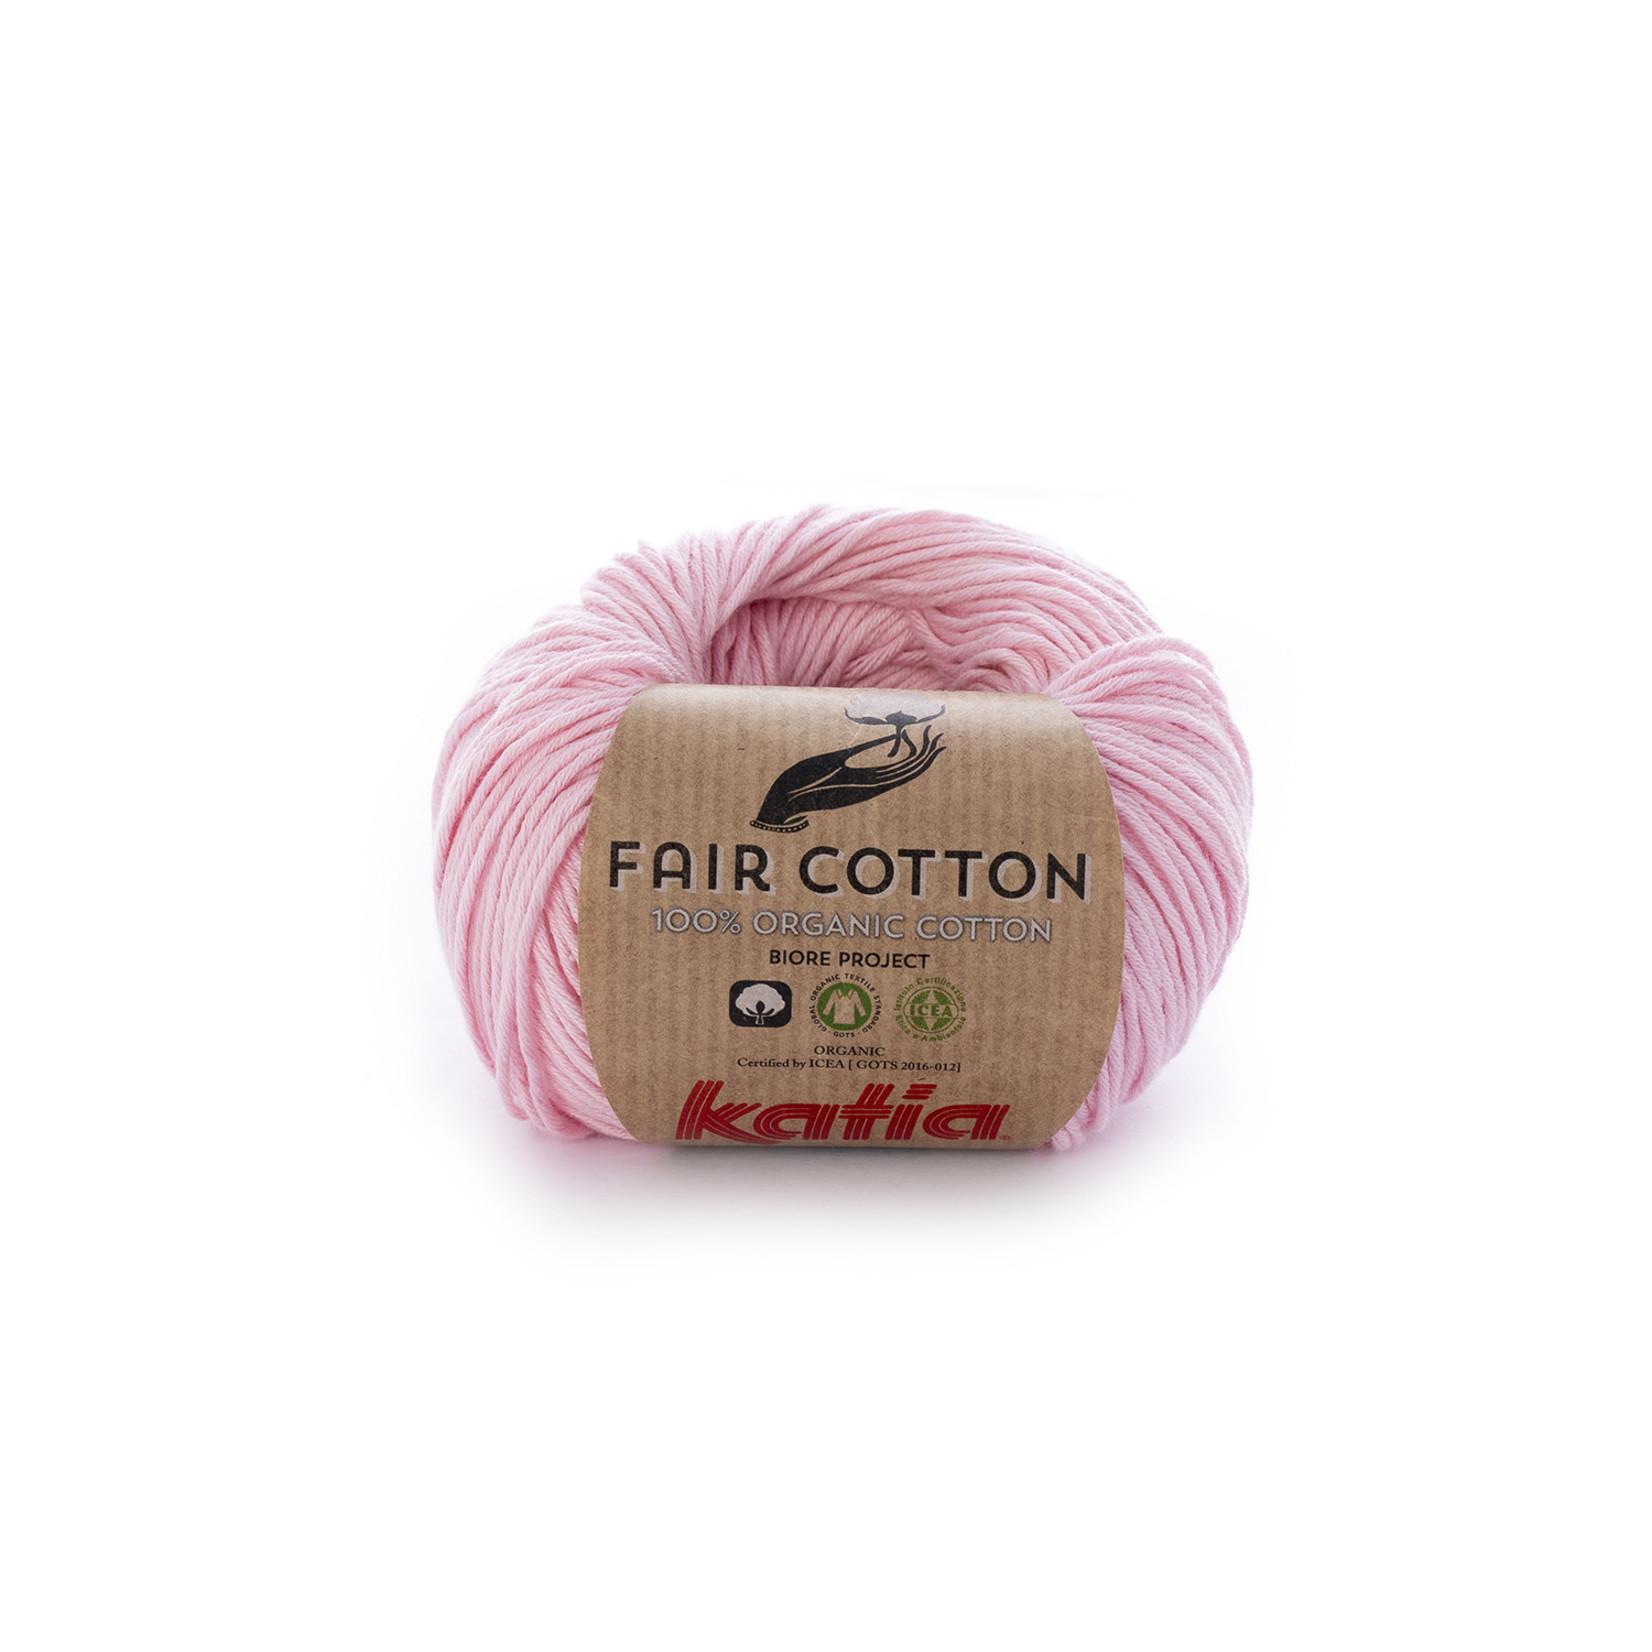 Katia Katia Fair Cotton 9 - bleekrood - 1 bol = 50 gr. = 155 m. - 100% biol. katoen